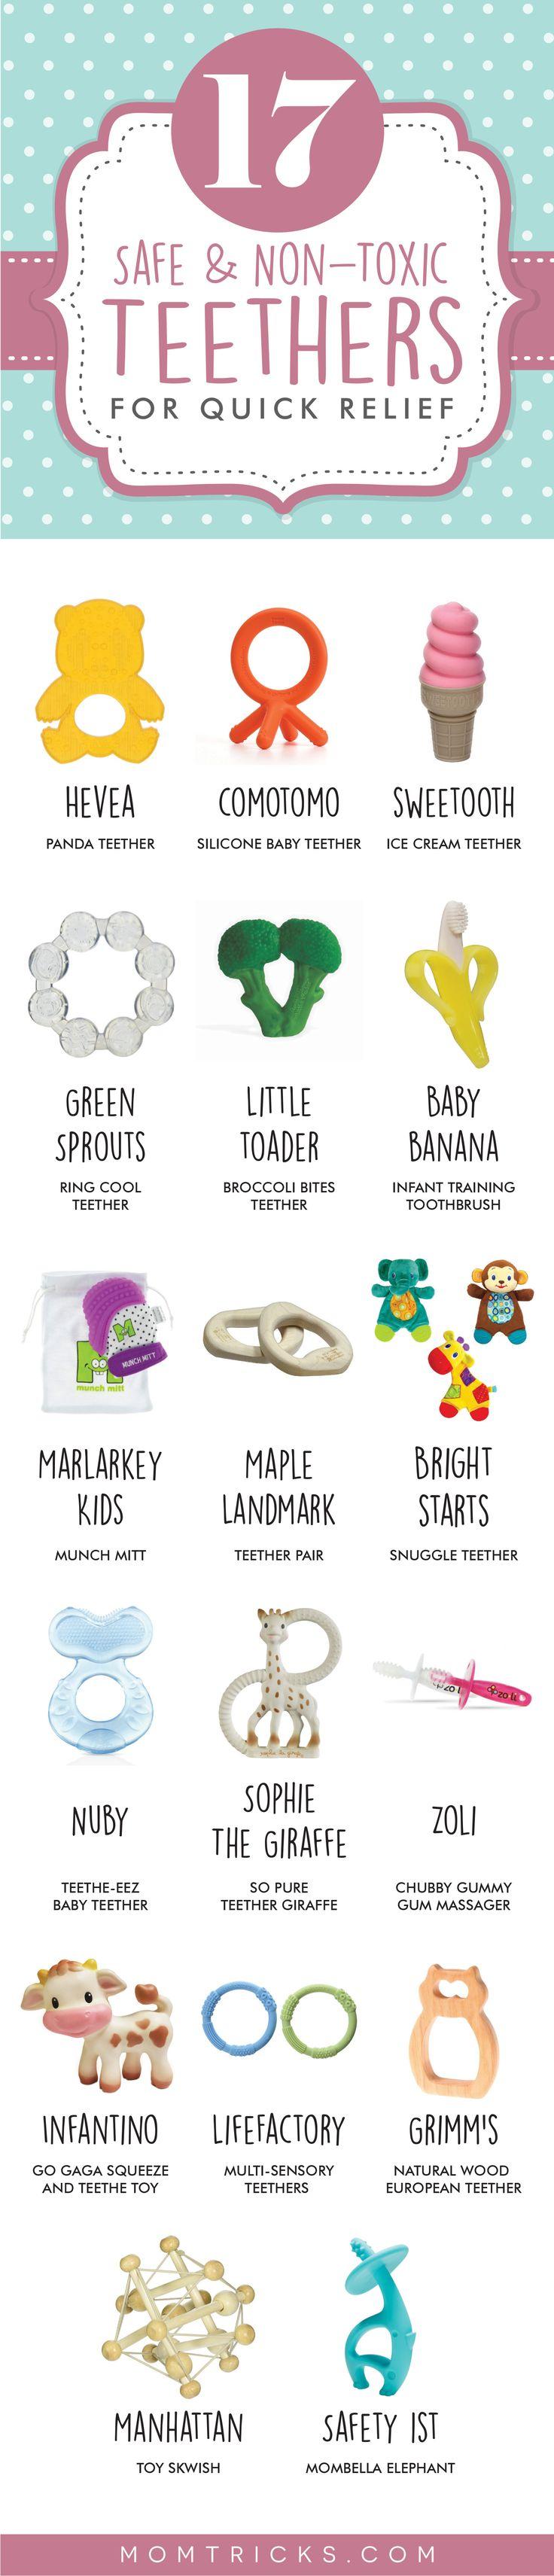 63 best The Sensitive Type 2 Child images on Pinterest